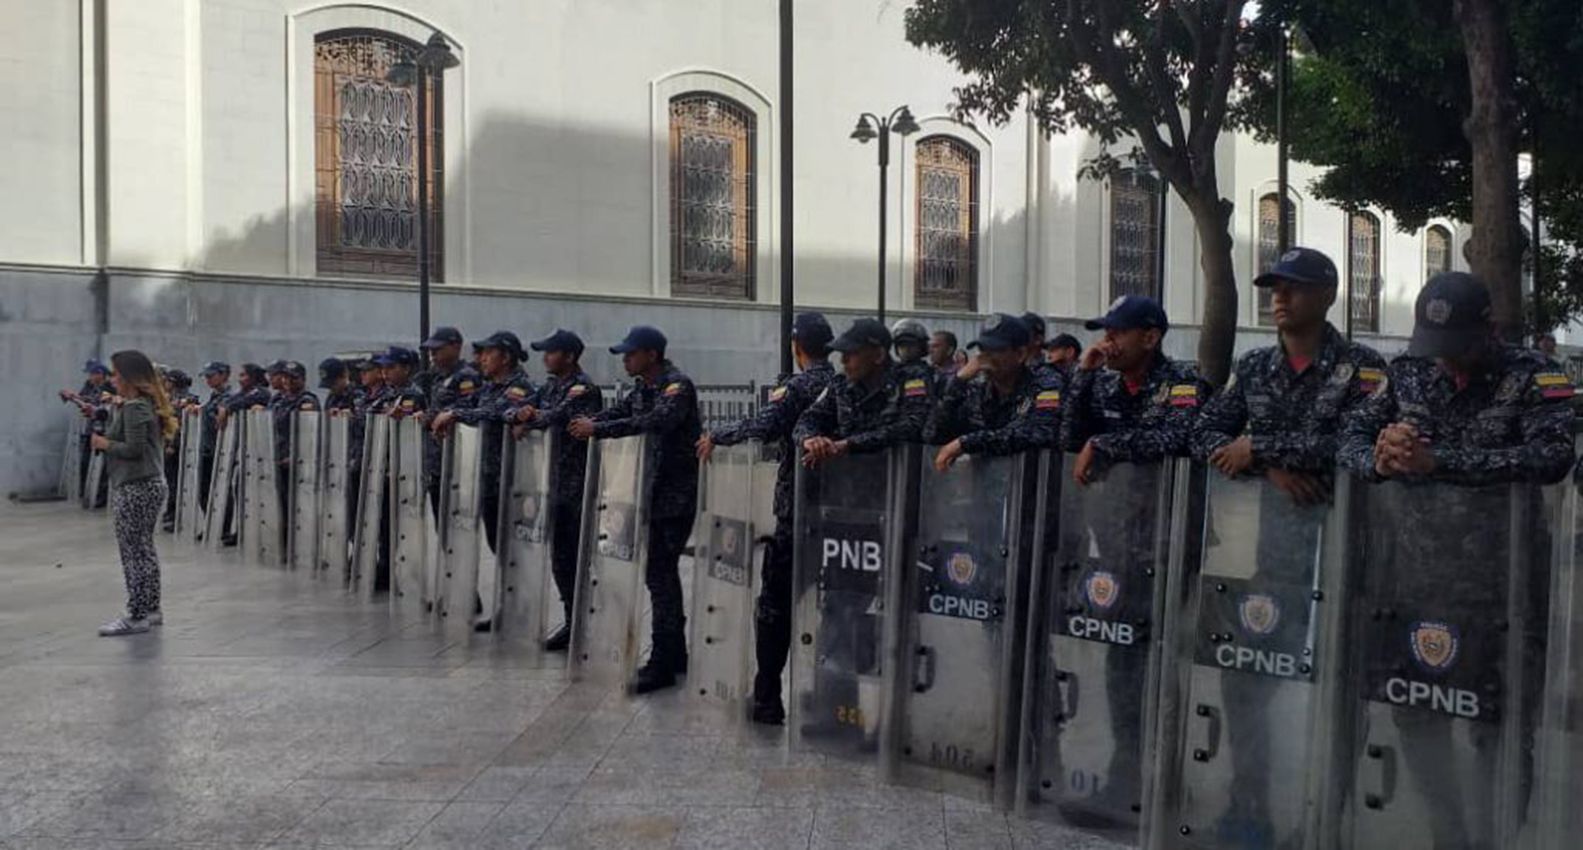 Cierran edificio administrativo de Parlamento venezolano